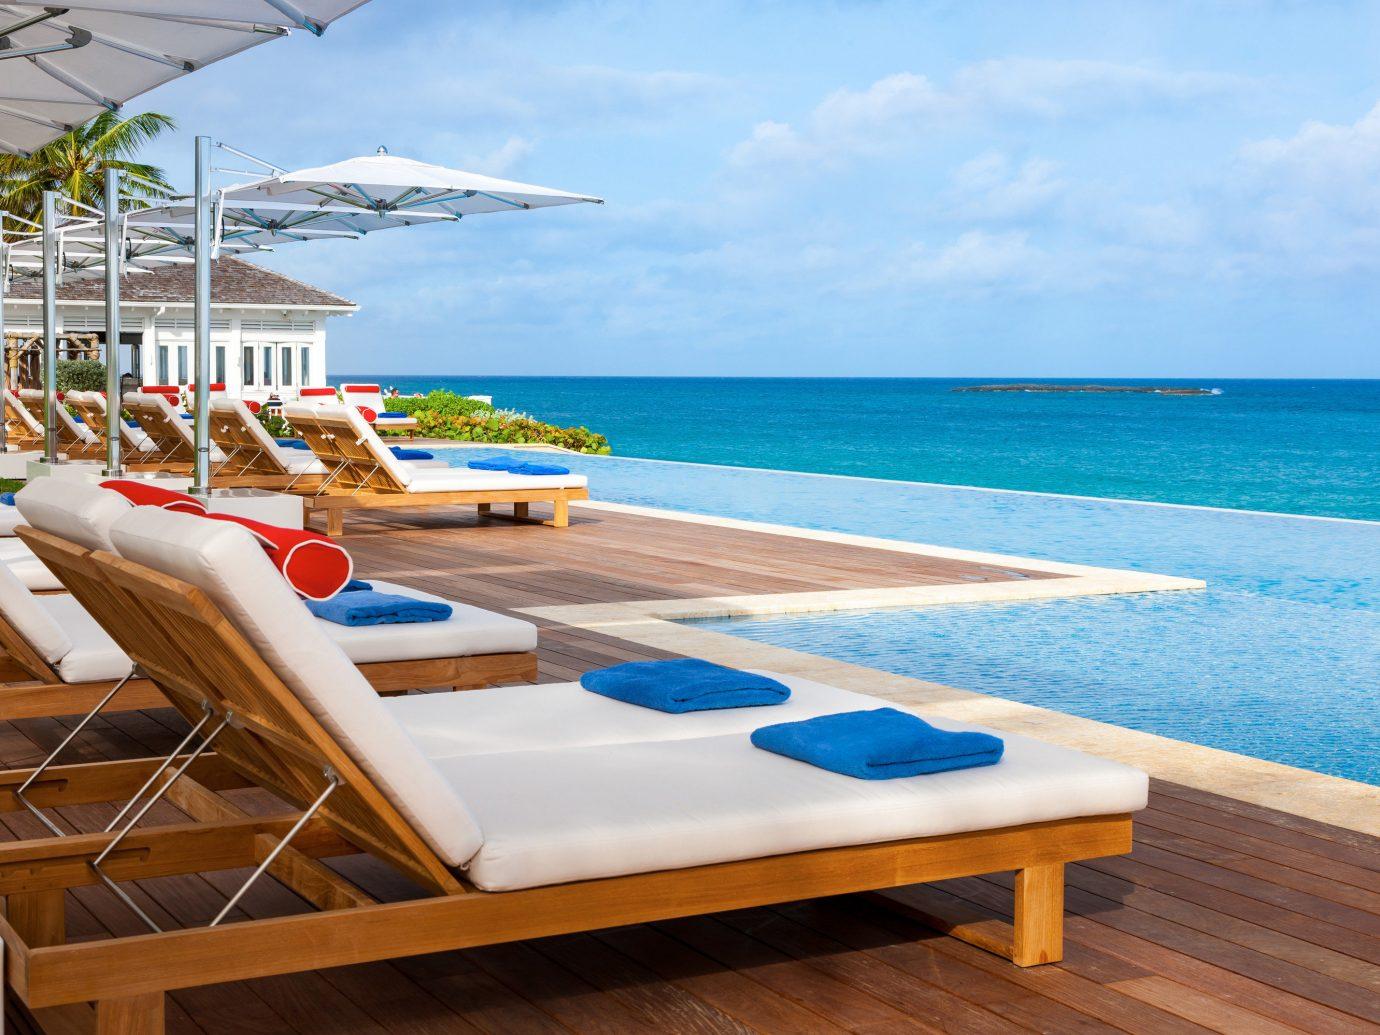 Hotels Romance Trip Ideas sky water chair outdoor leisure Beach property swimming pool vacation caribbean Resort Ocean Sea furniture estate Villa Deck